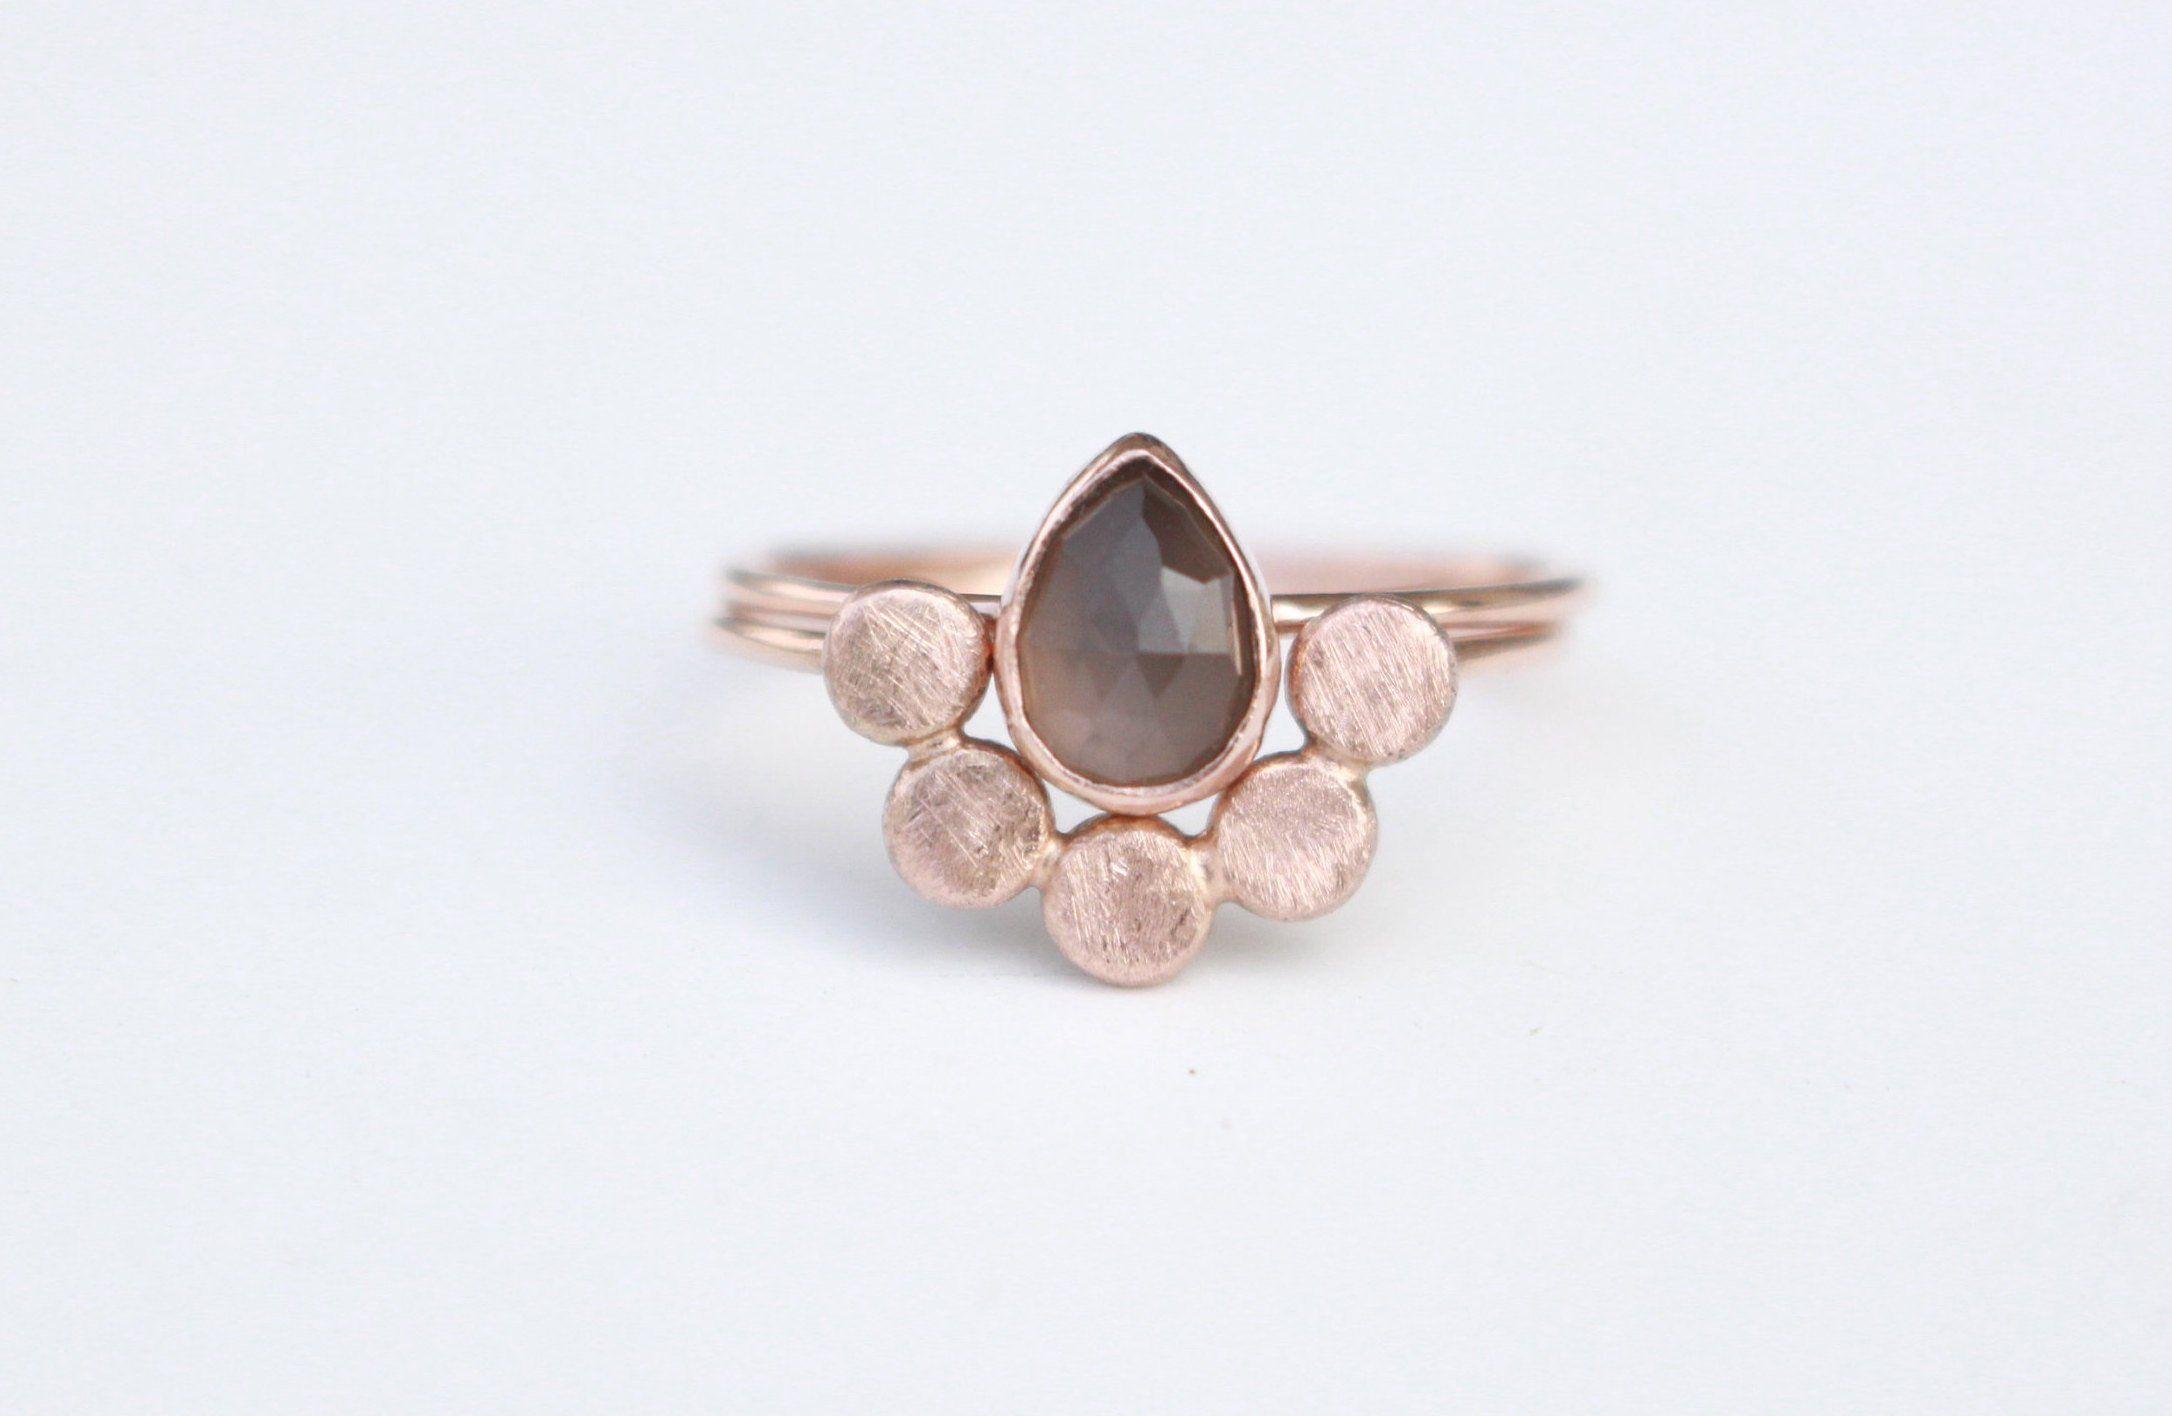 Anakrolljewelry Jewelry In 2018 Pinterest Engagement Rings